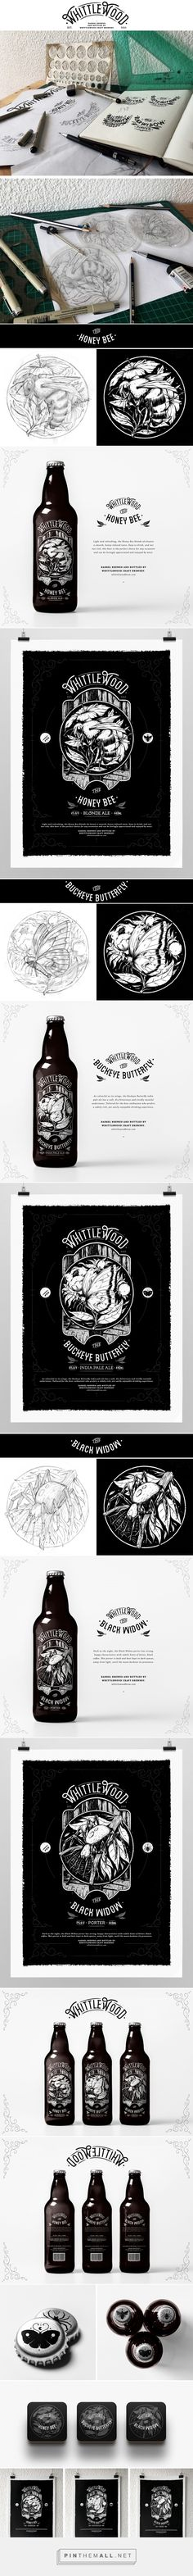 WhittleWood Craft Brewery packaging design by Christi du Toit - http://www.packagingoftheworld.com/2016/11/whittlewood-craft-brewery.html